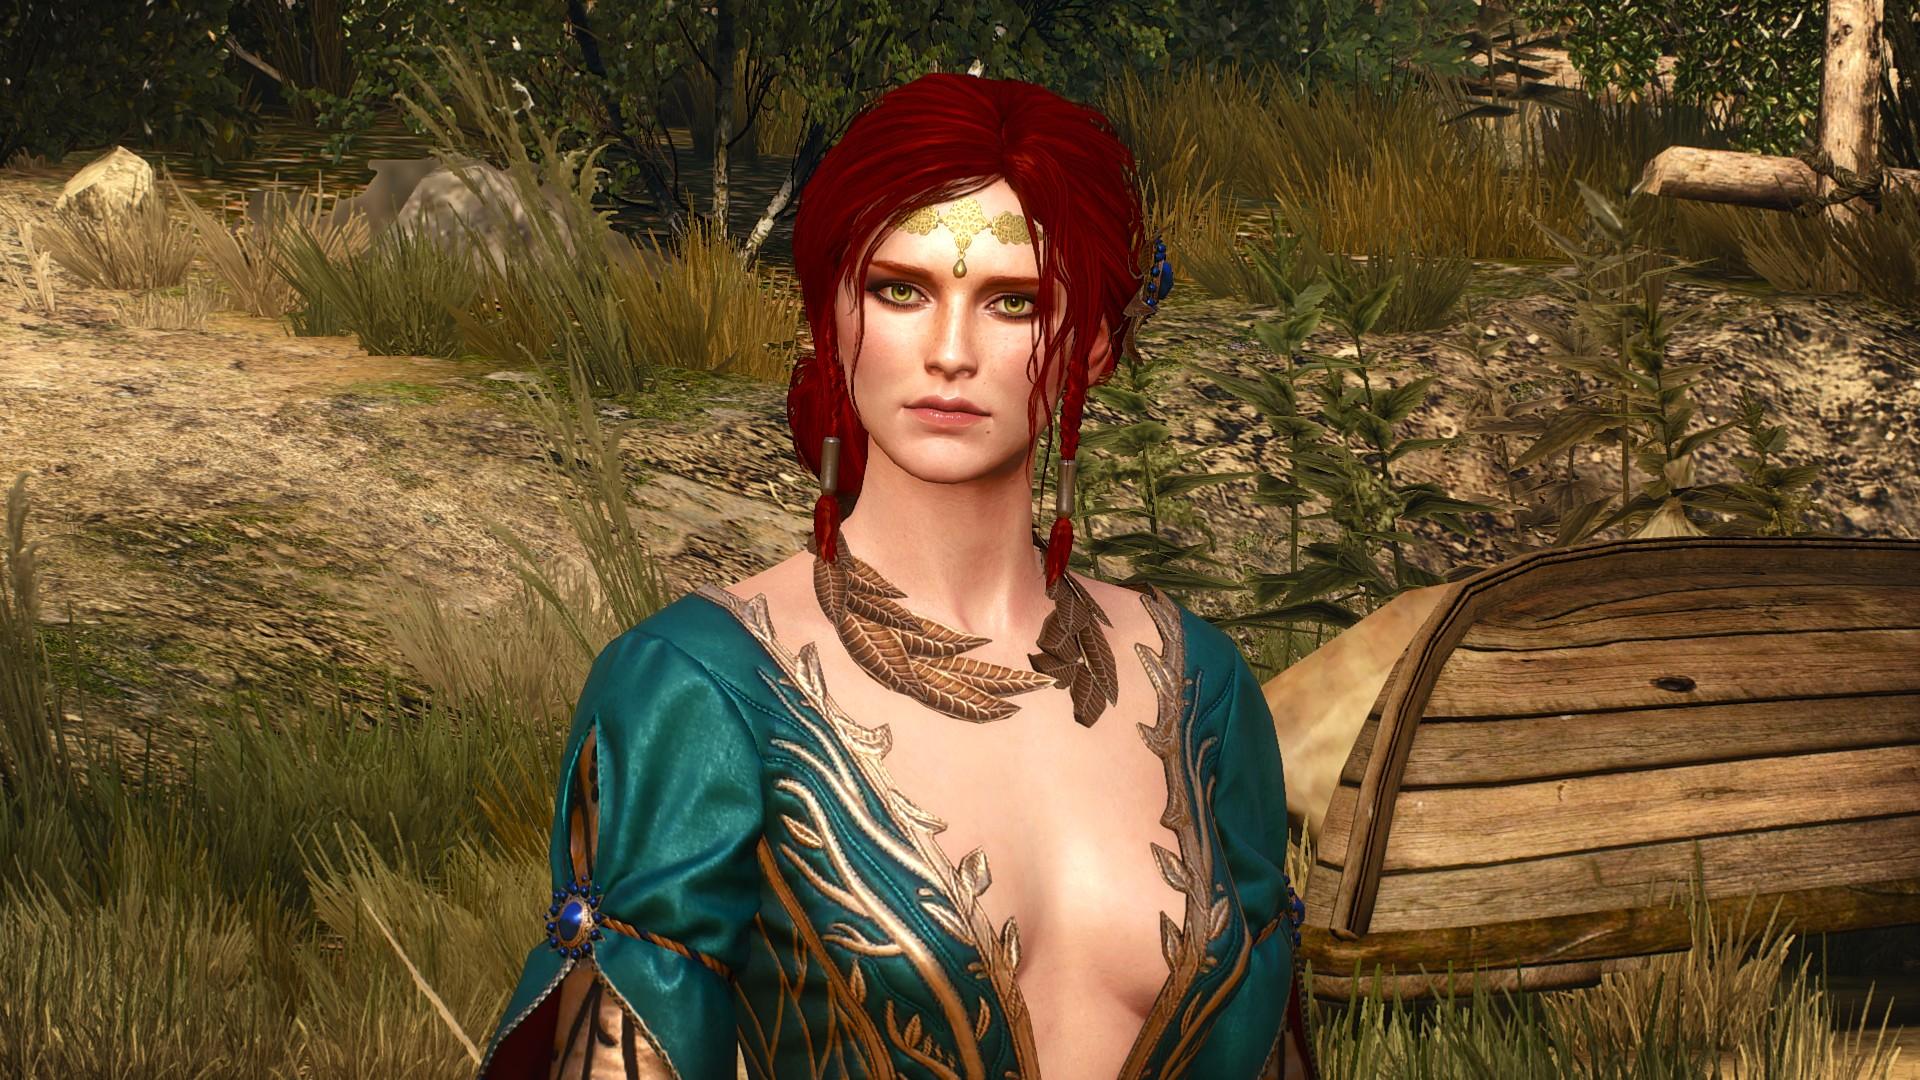 4K - Witcher 3: Wild Hunt, the